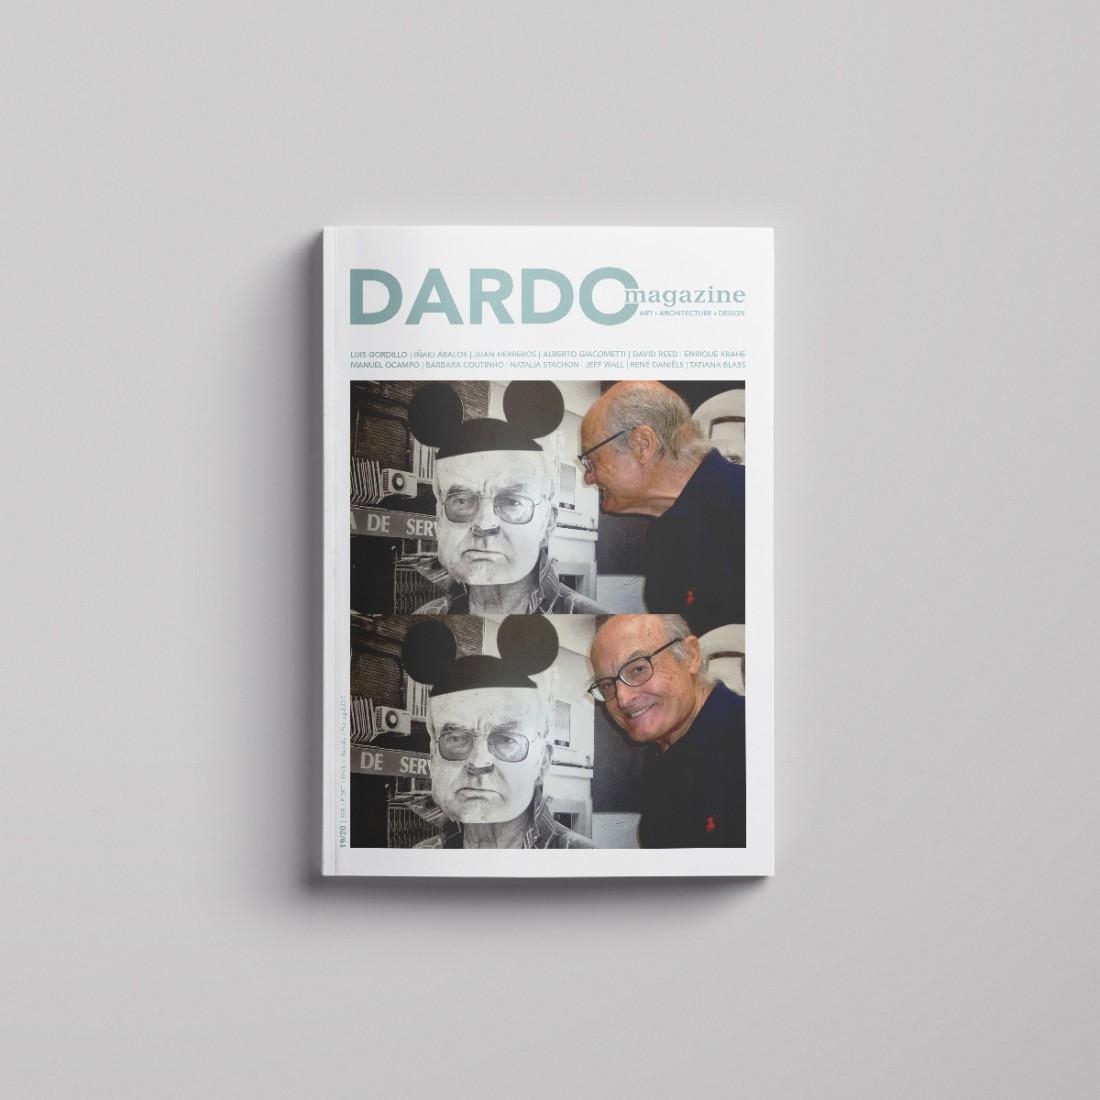 DARDOmagazine 19-20